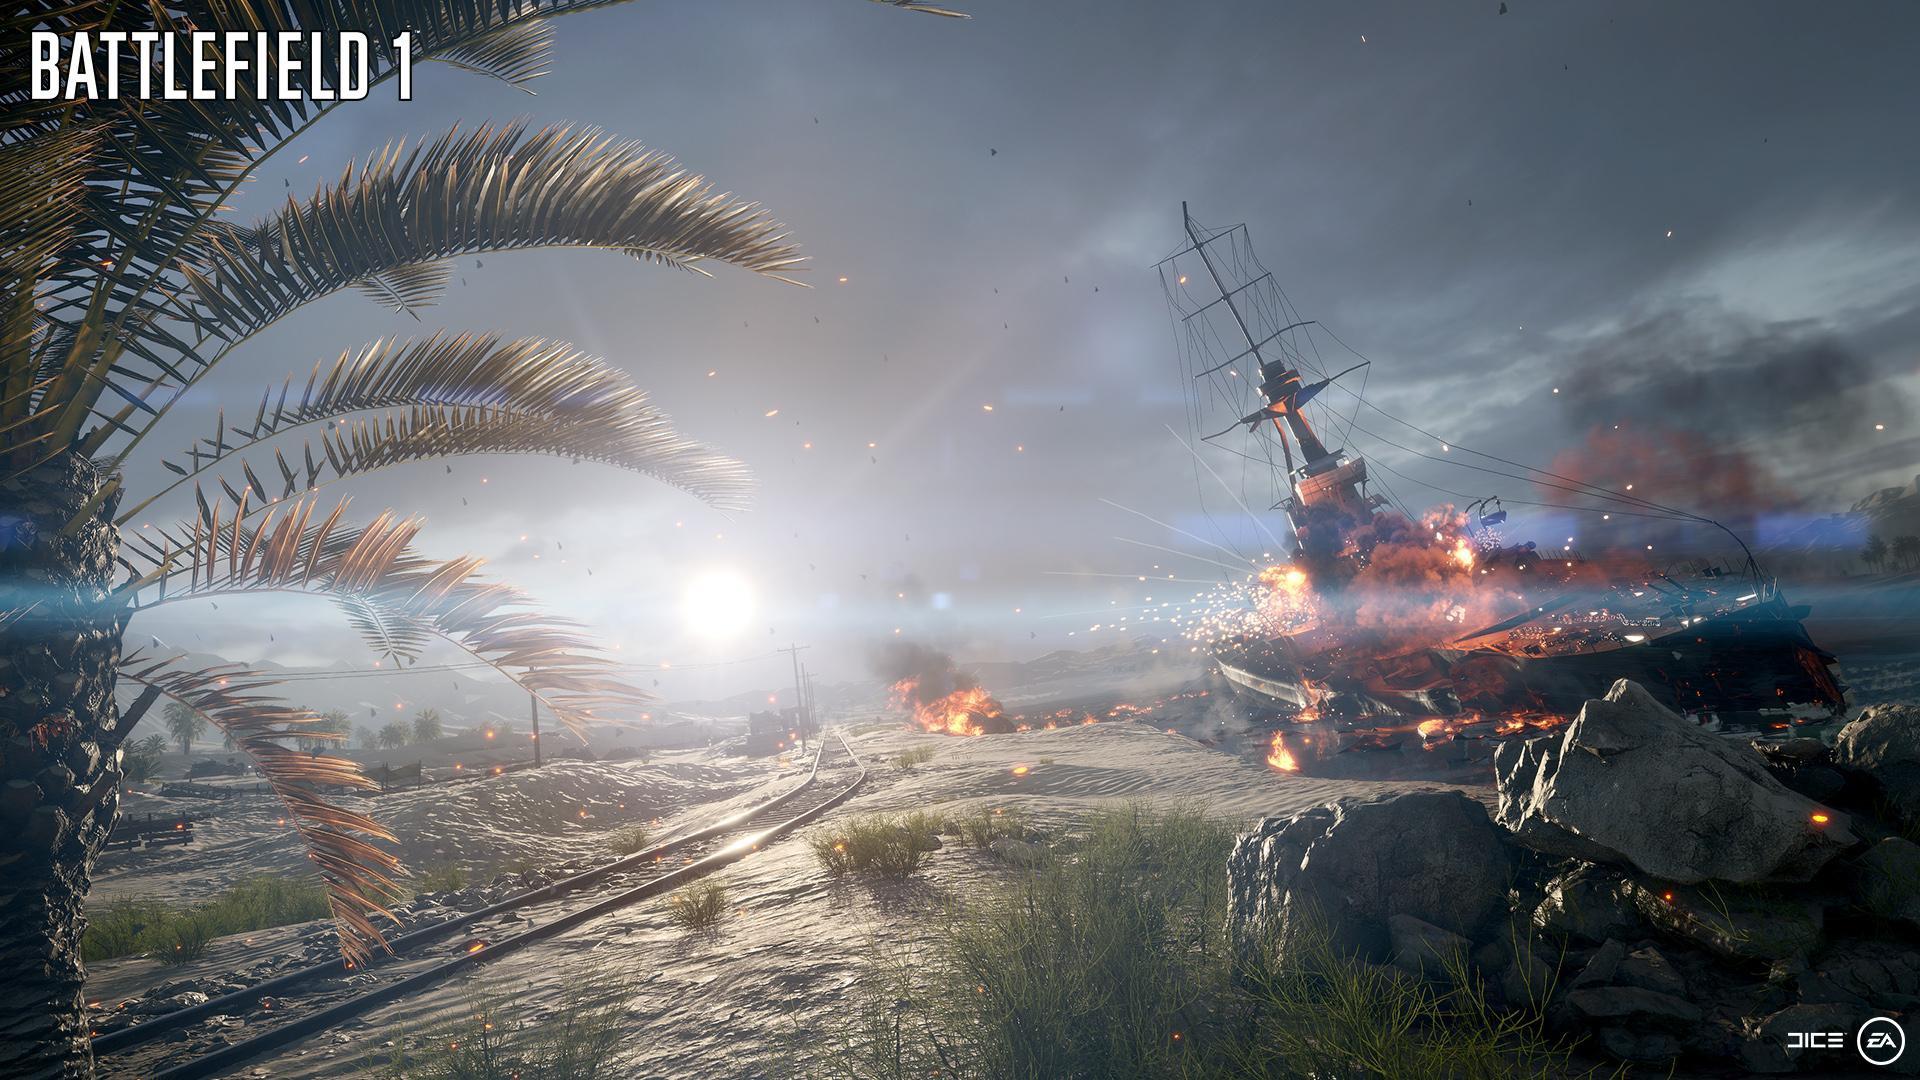 Battlefield 1 War Video Game Hd Wallpaper: Battlefield 1 HD Wallpapers, Pictures, Images